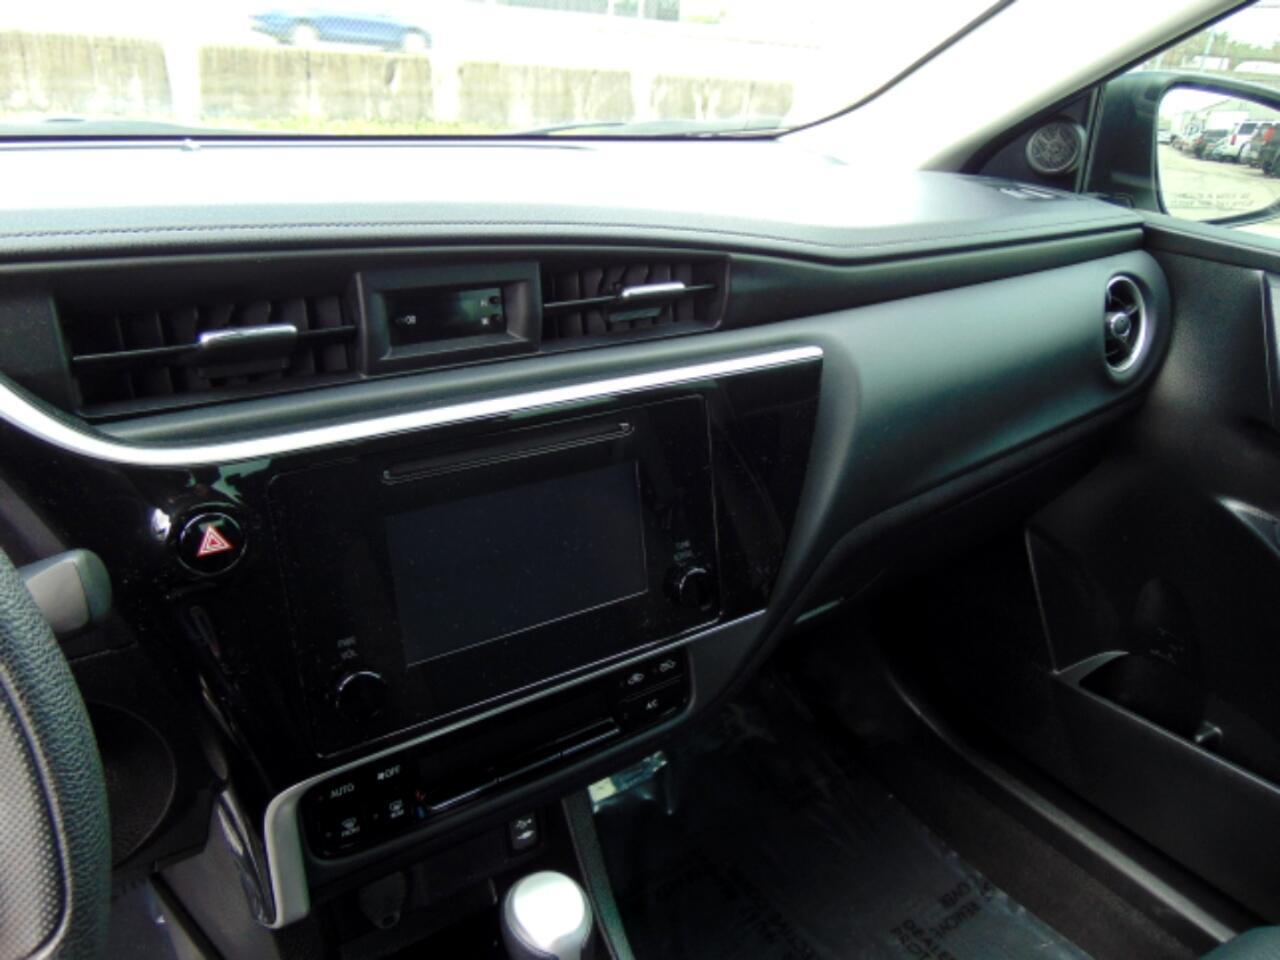 2019 Toyota Corolla SE CVT (Natl)